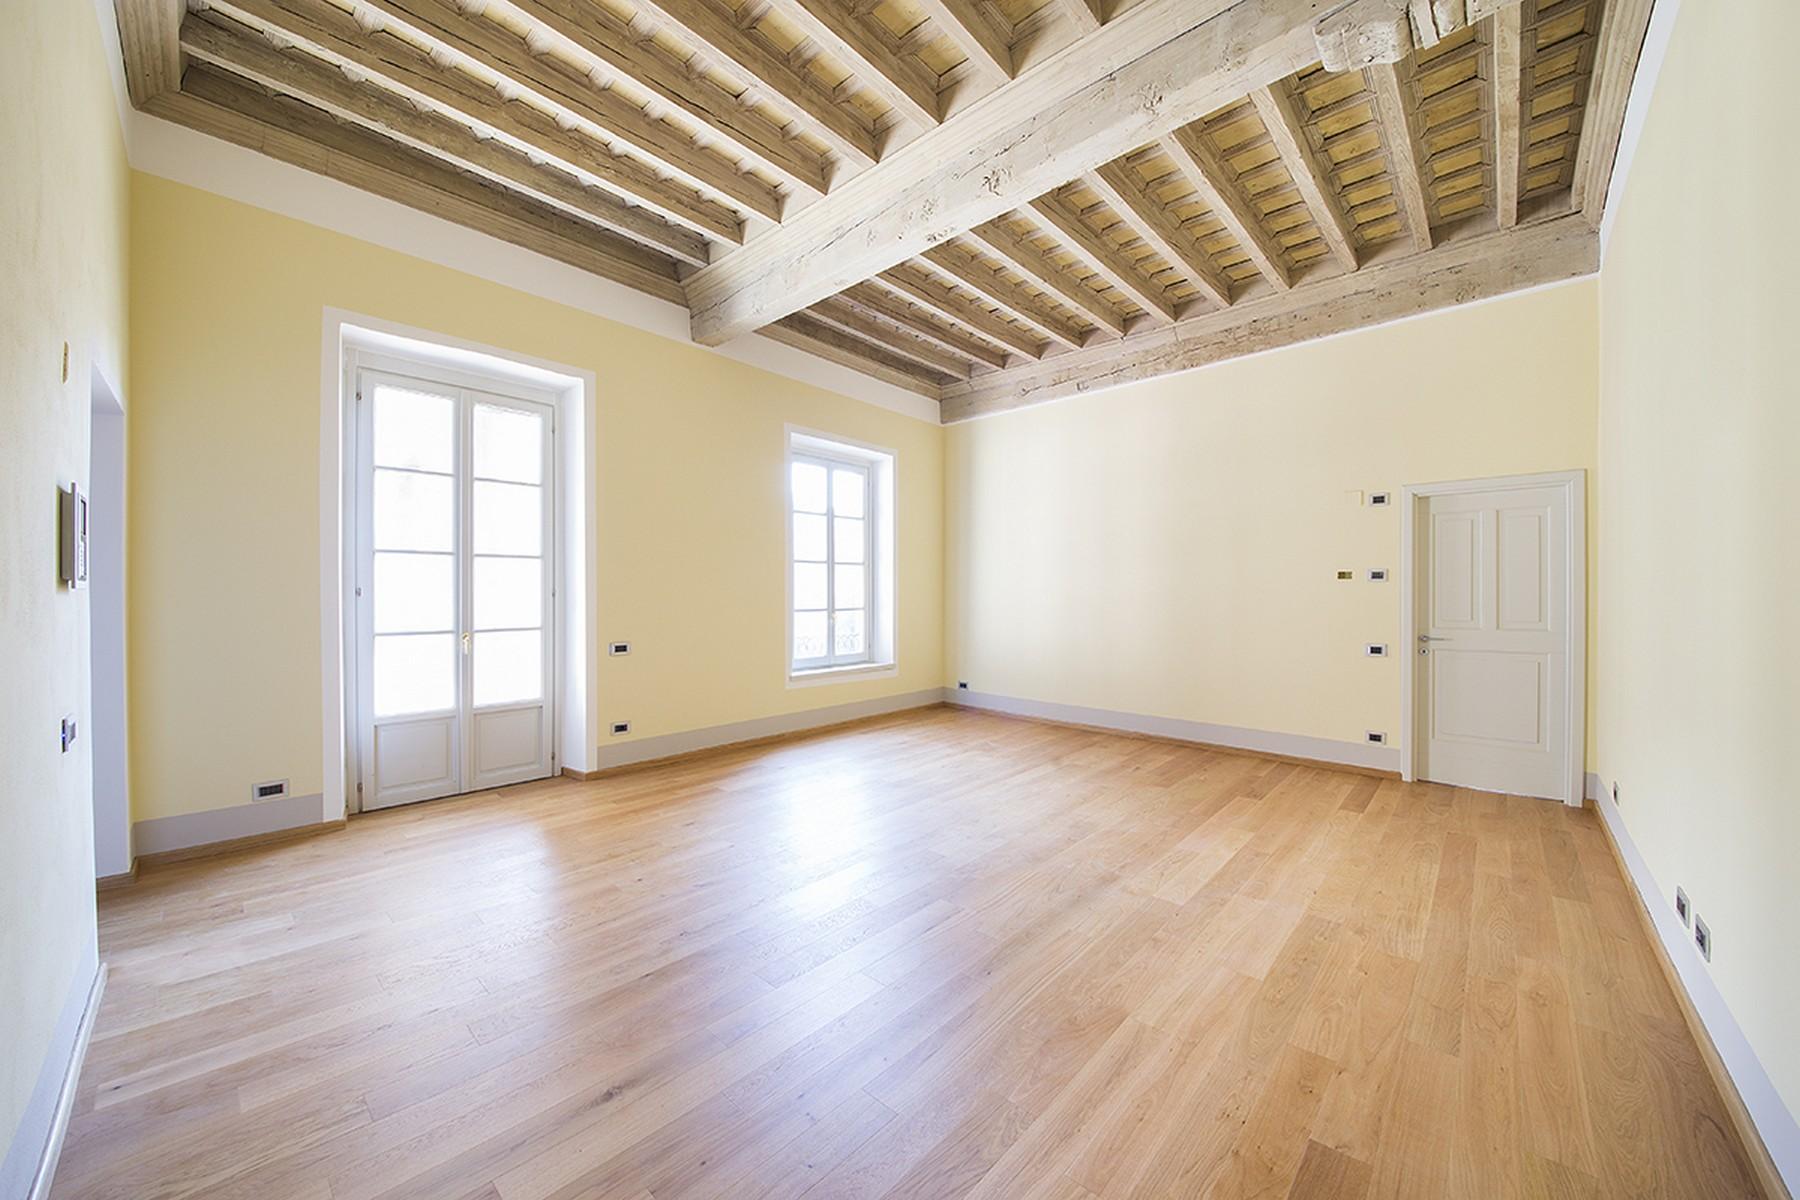 Additional photo for property listing at Newly built apartment in the historic center of Como Via Cinque Giornate Como, Como 22100 Italy